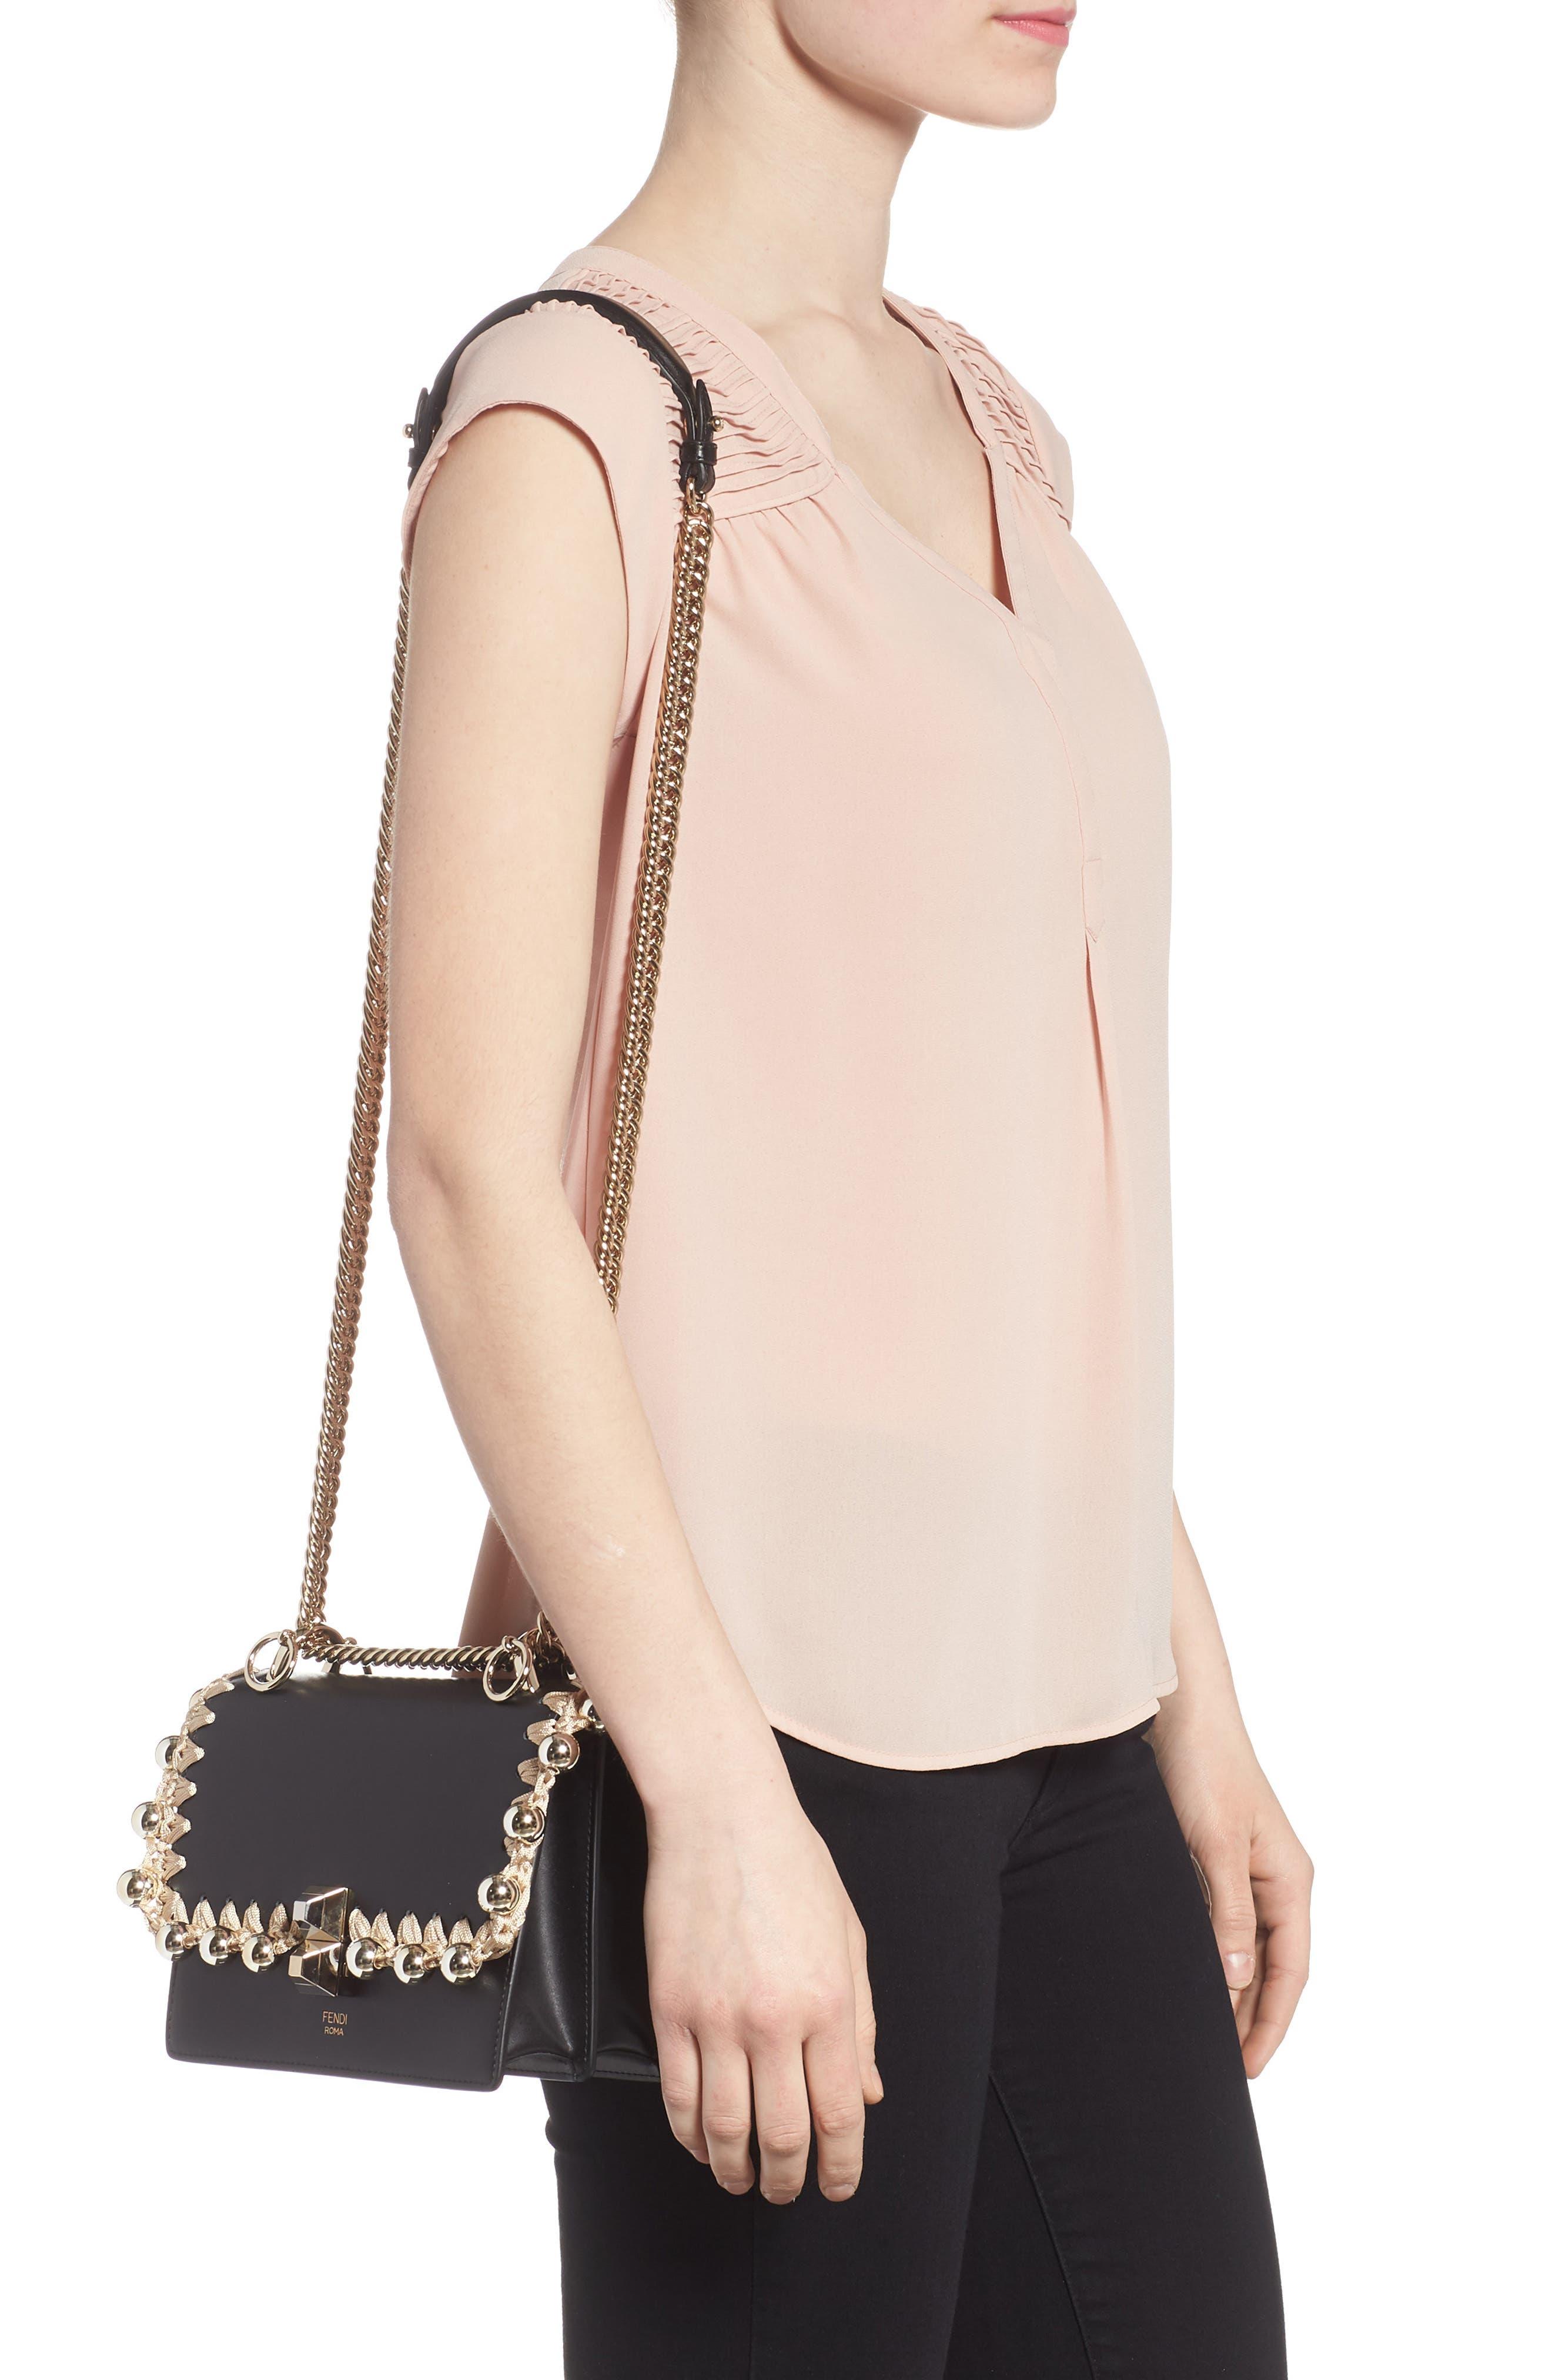 Small Kan I Leather Shoulder Bag,                             Alternate thumbnail 2, color,                             Nero/ Oro/ Chiaro